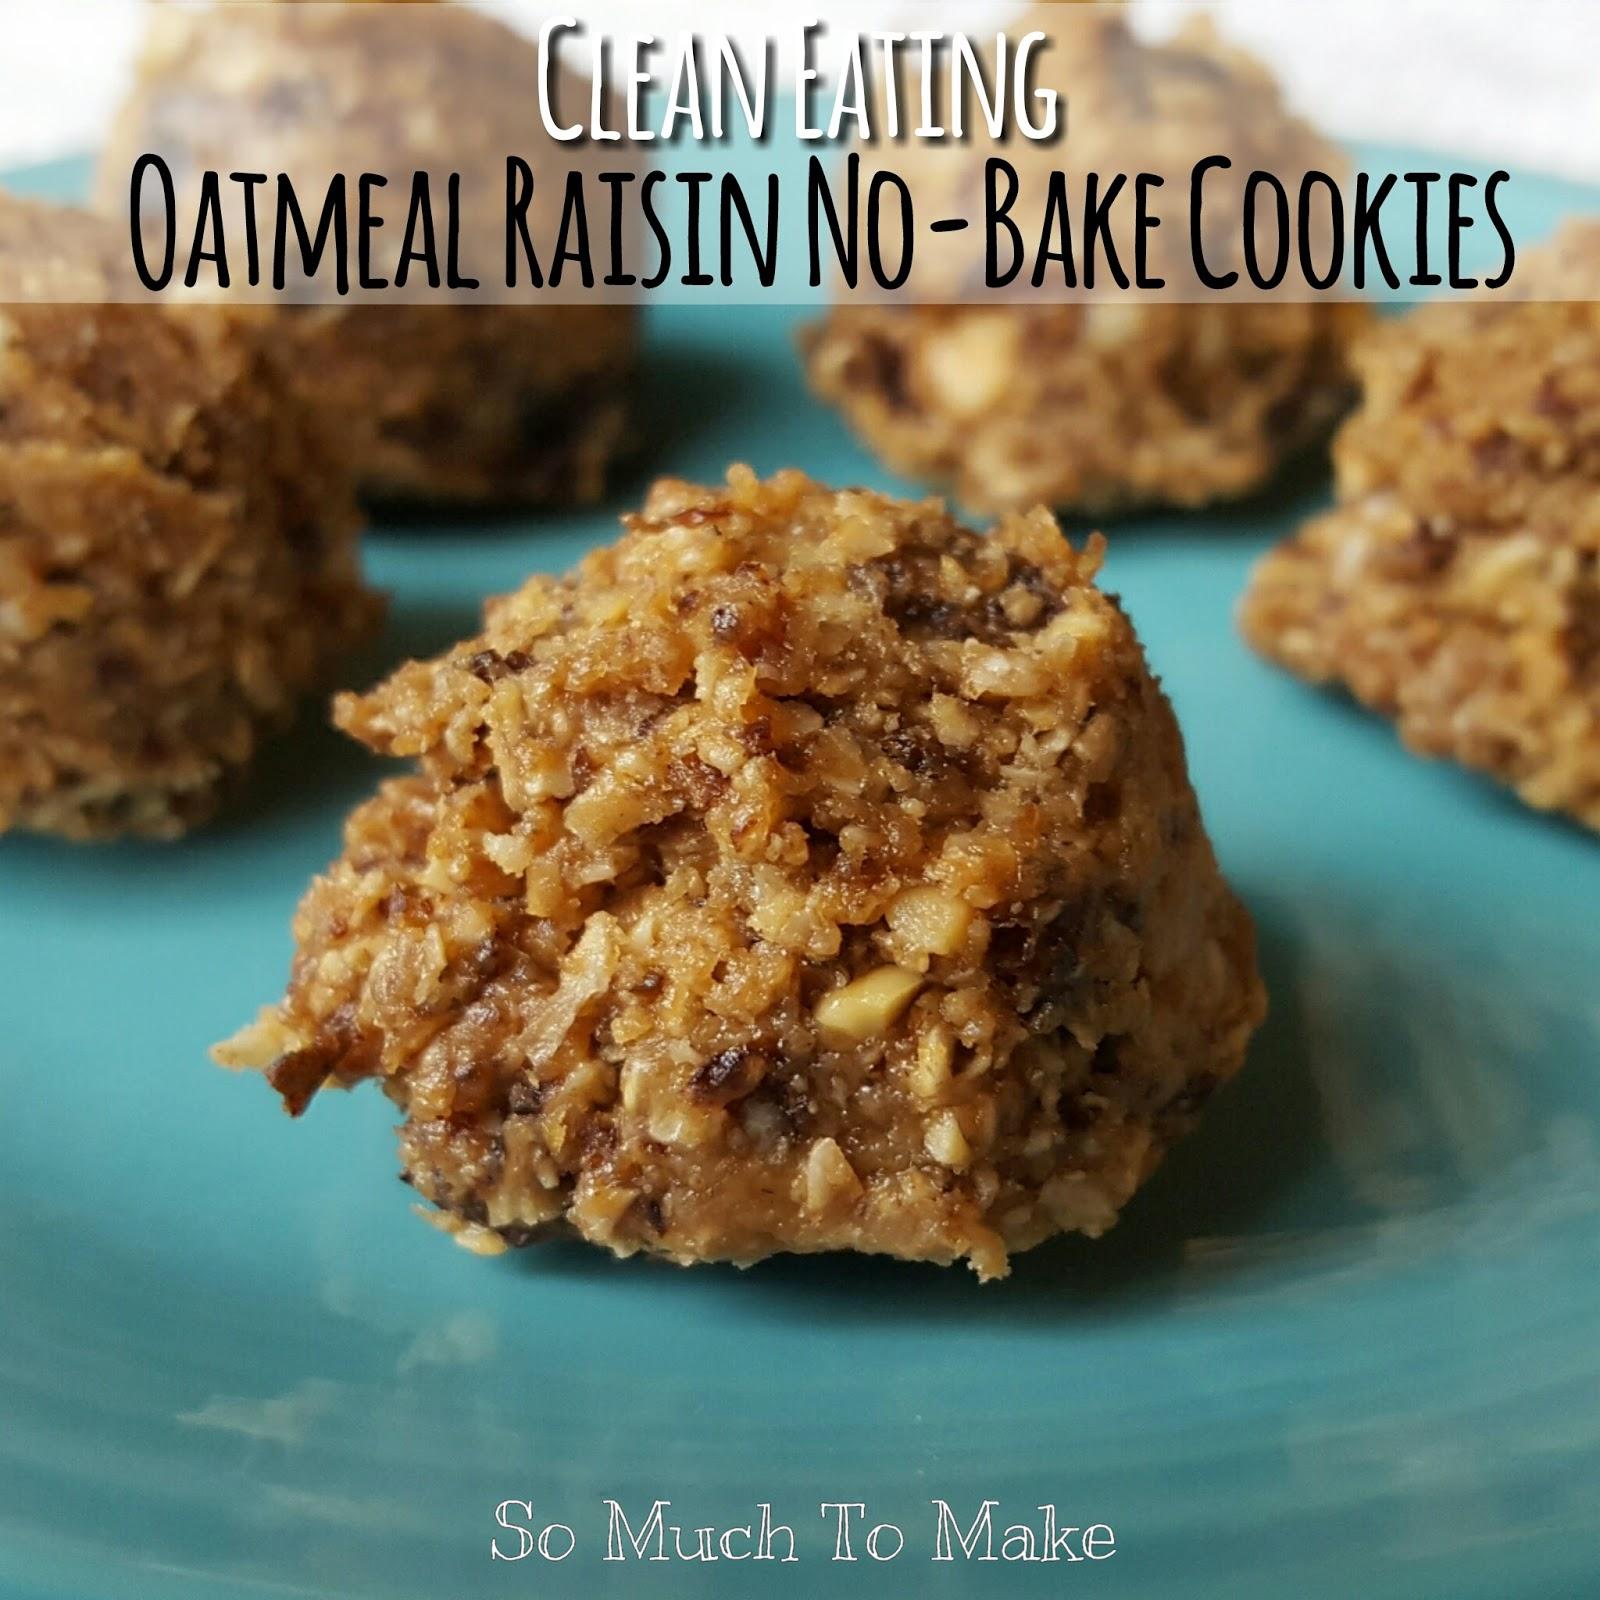 Clean Eating Oatmeal Raisin No